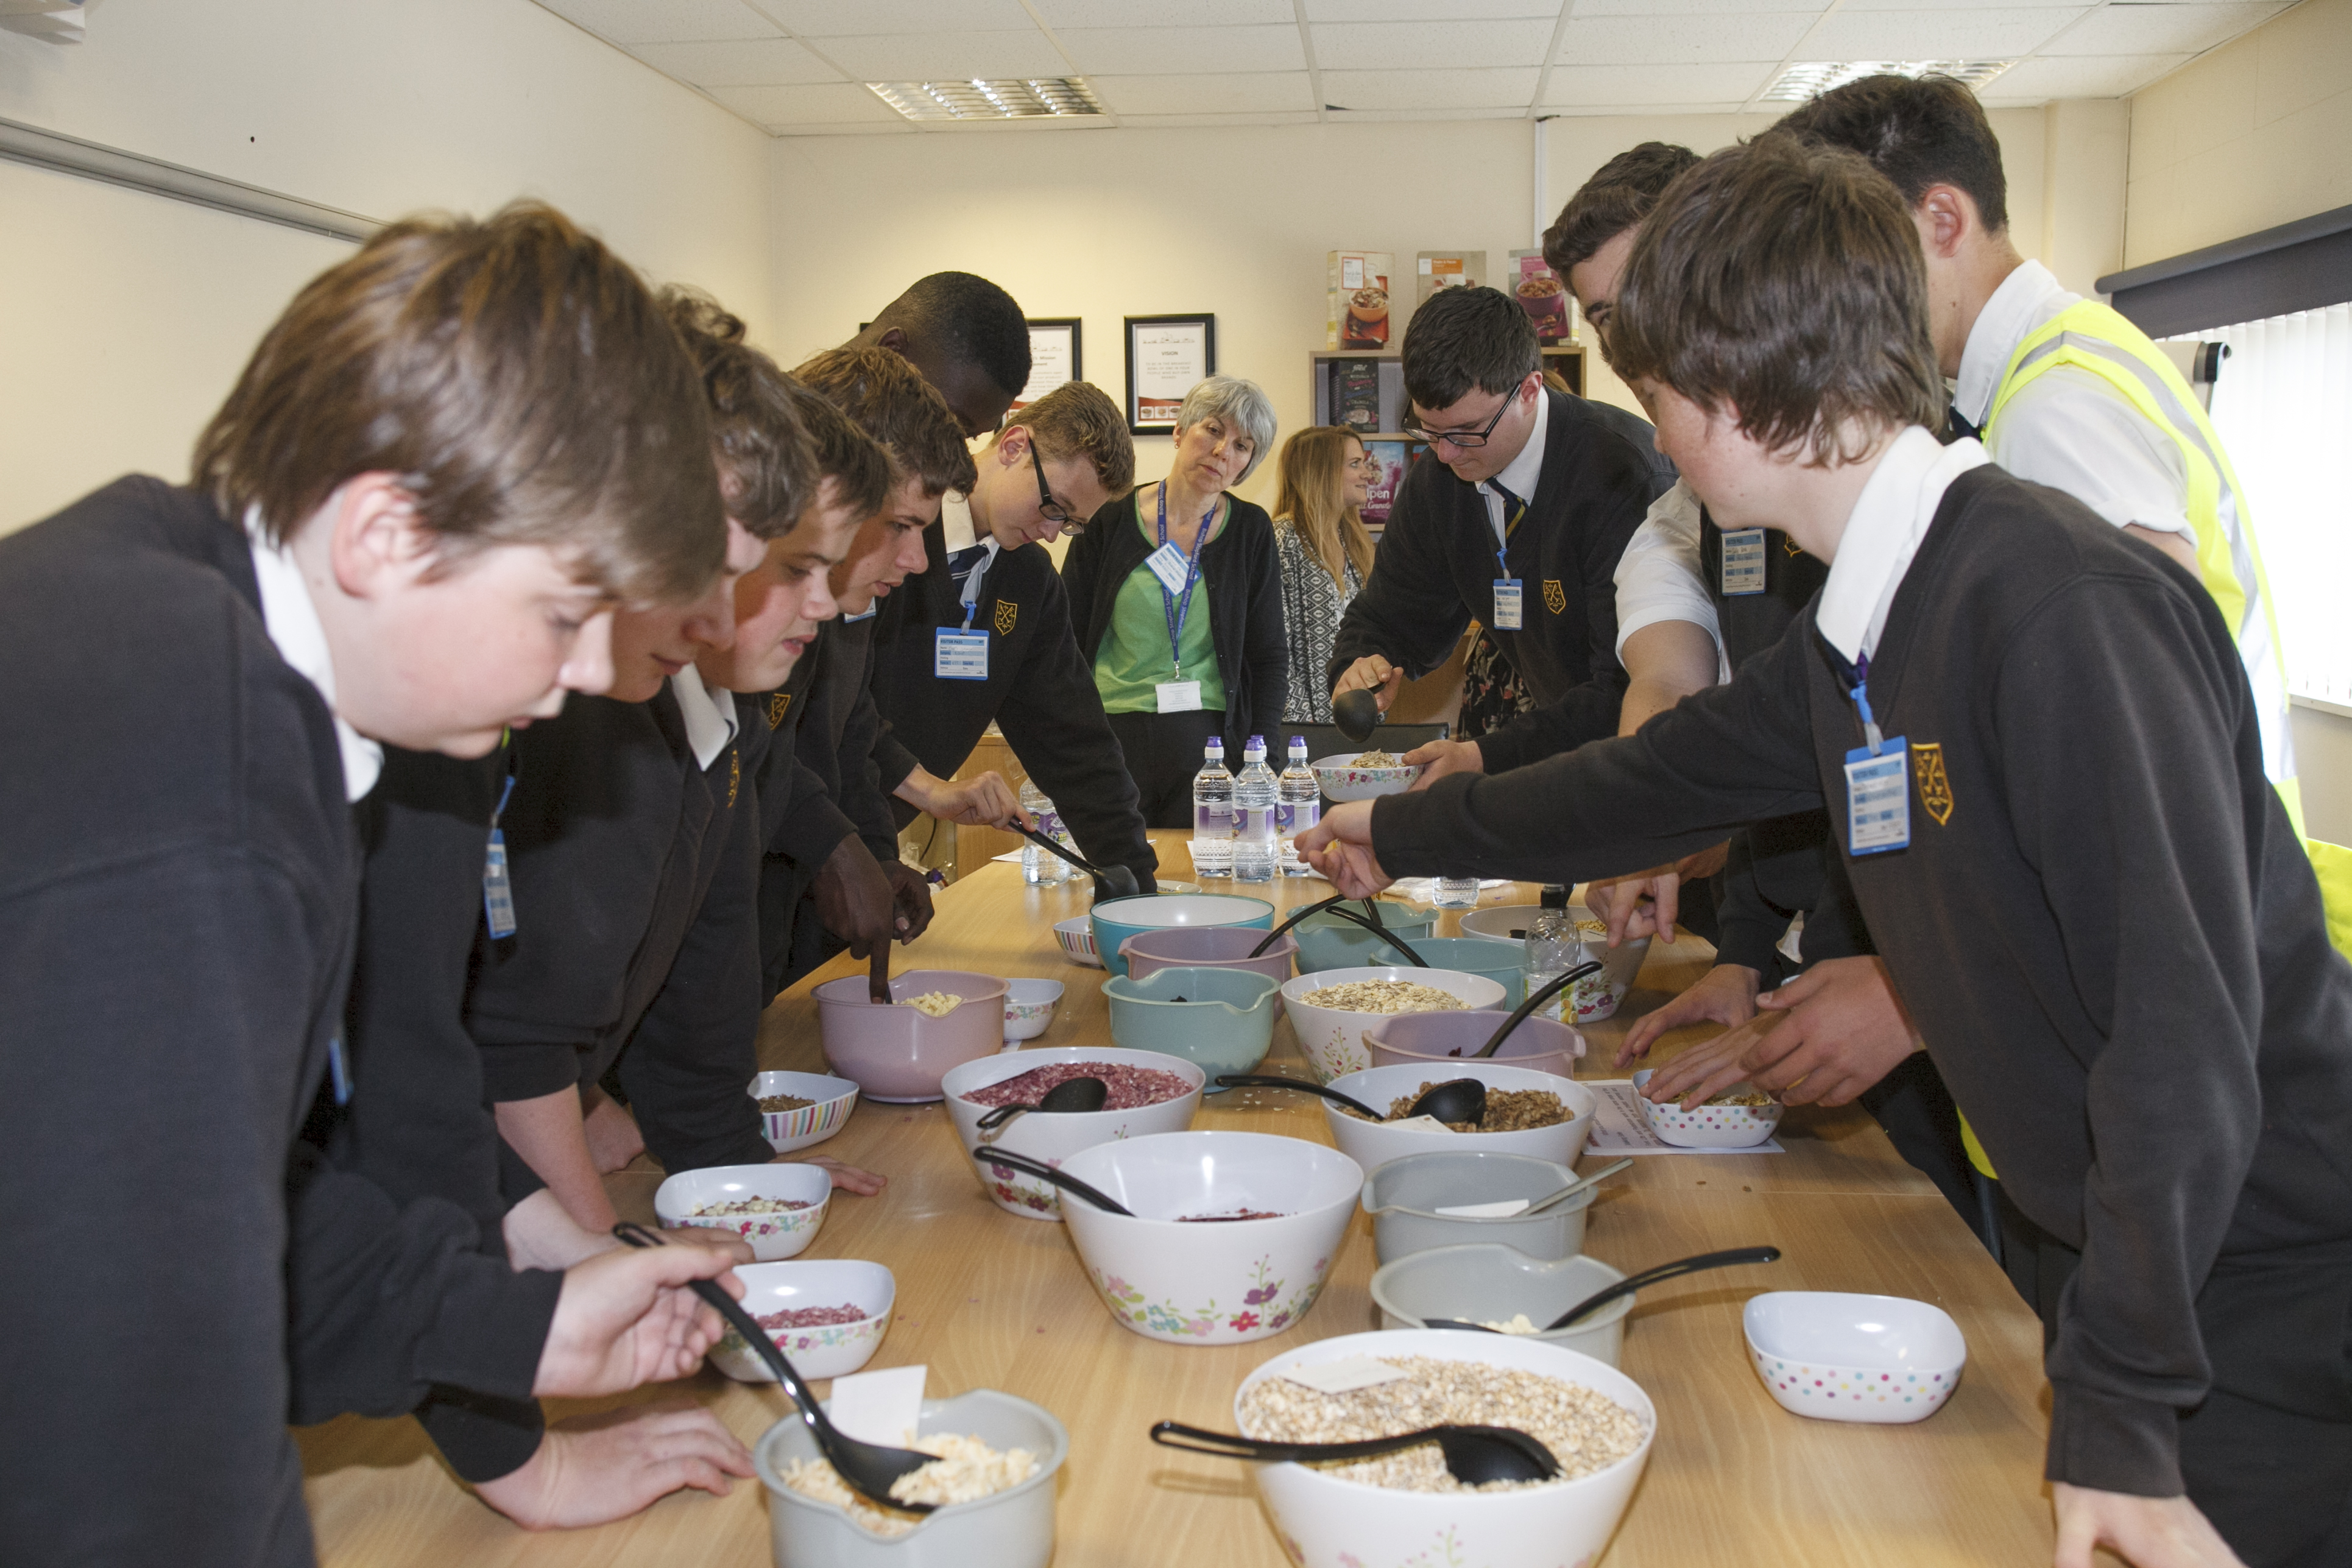 Bokomo Foods opens its doors to local students